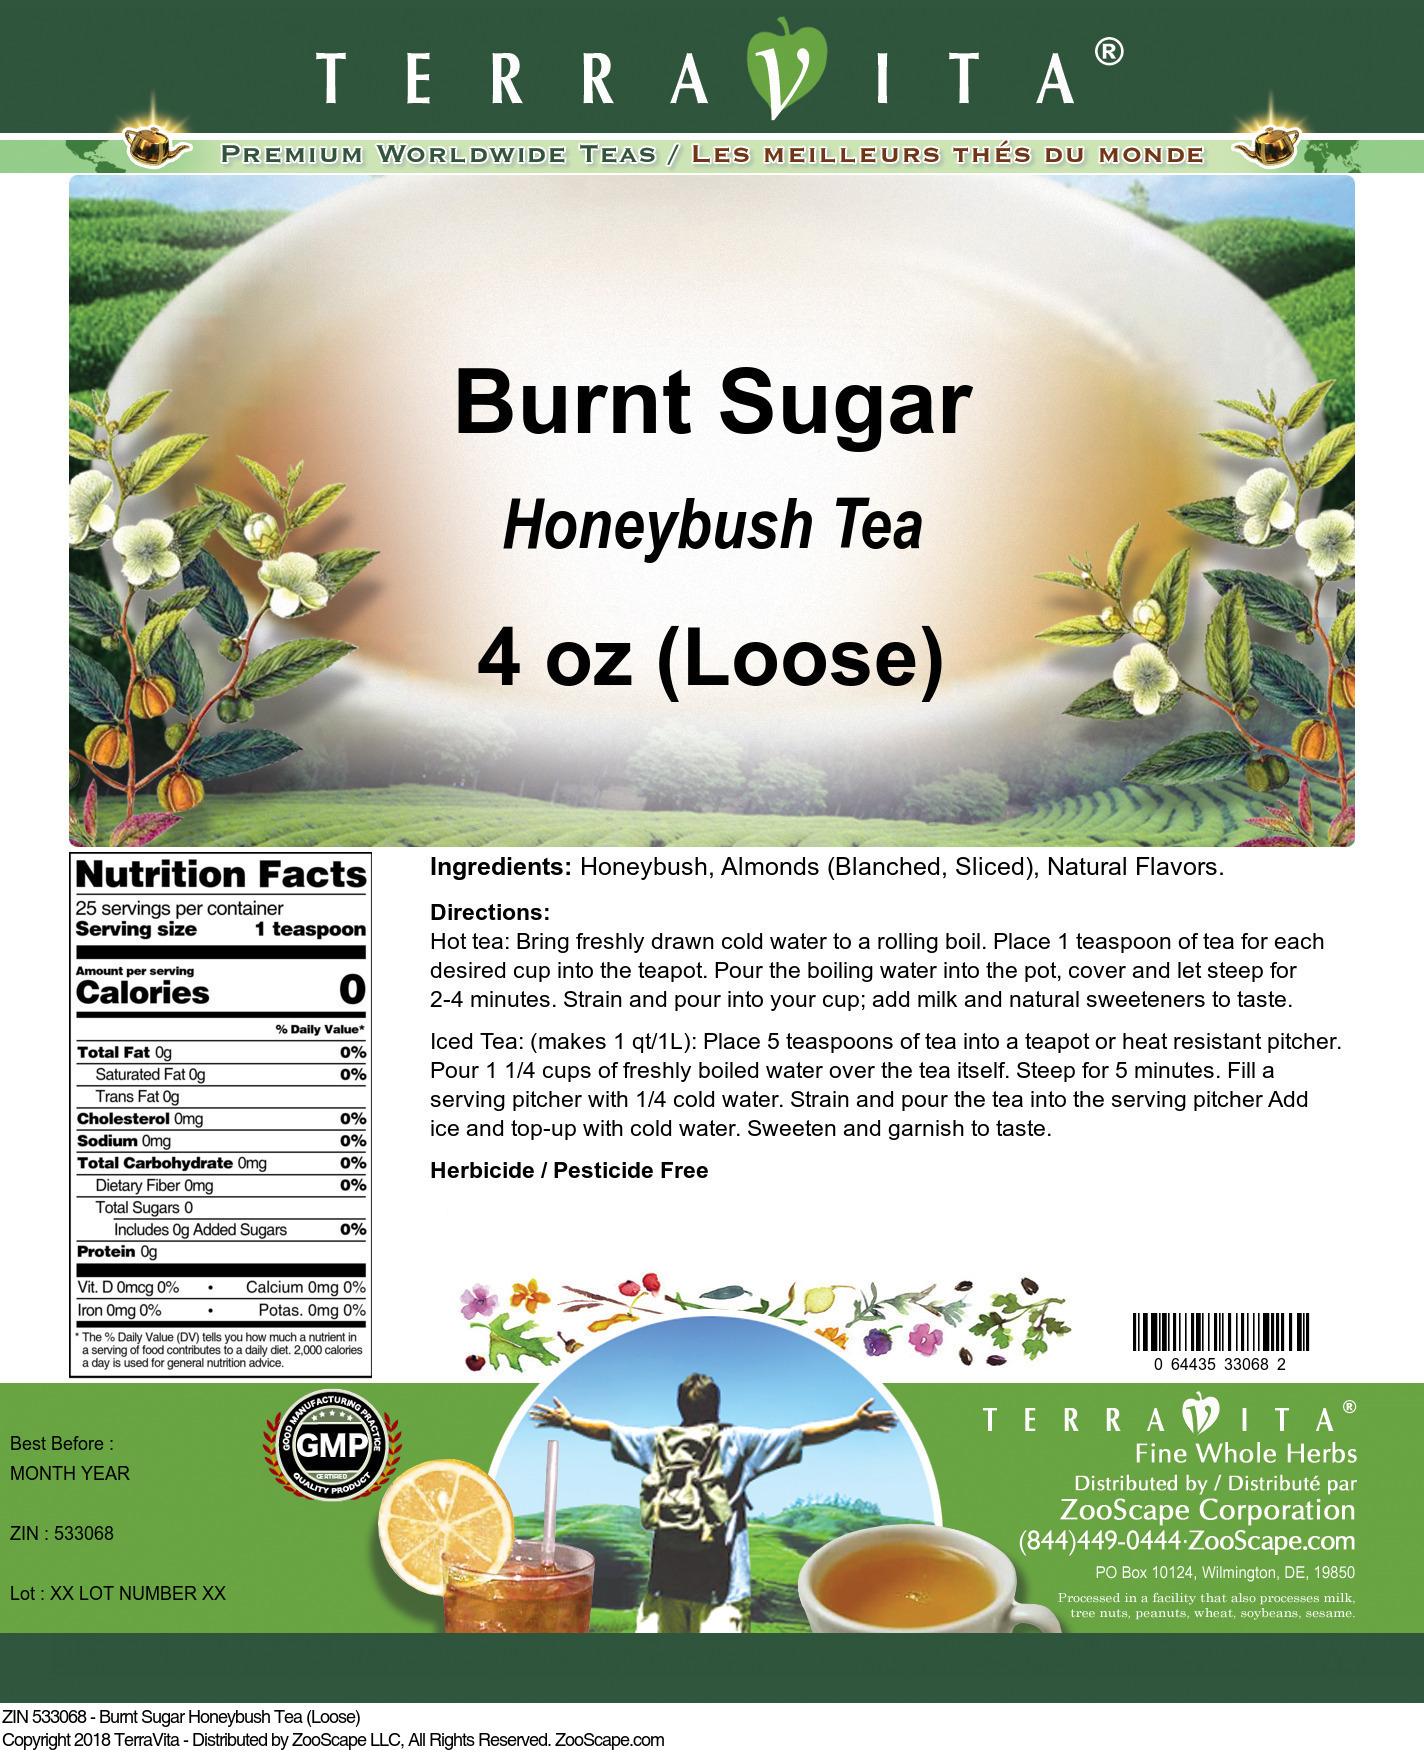 Burnt Sugar Honeybush Tea (Loose)